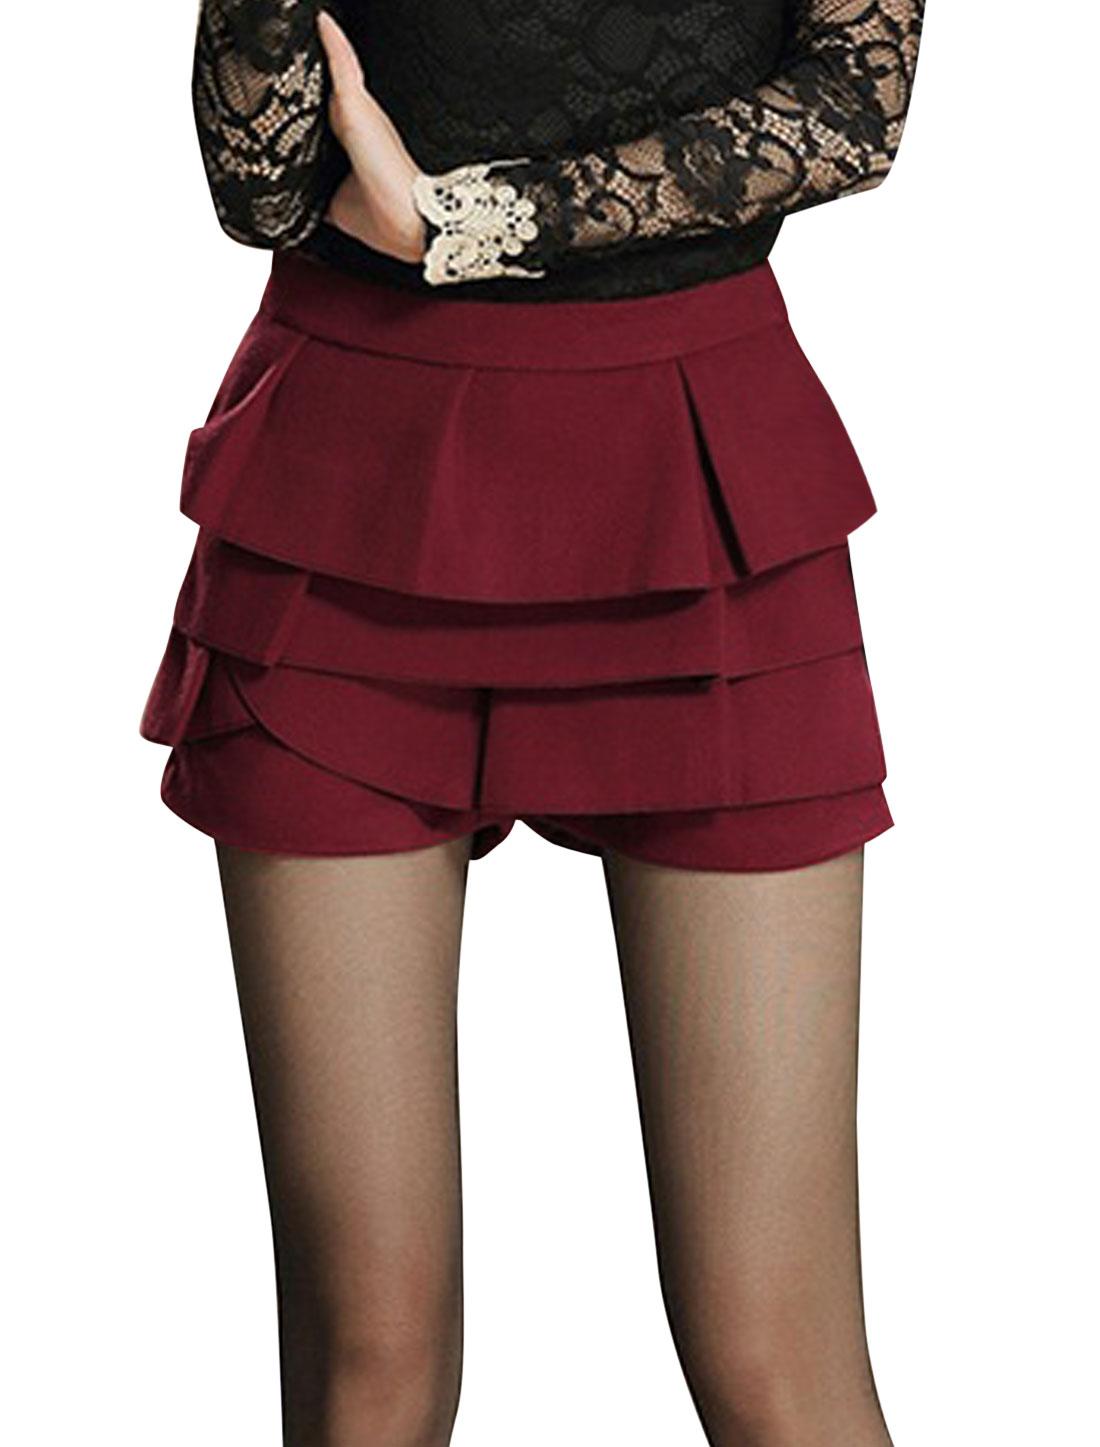 Lady Fashion Style Hidden Zipper Tiered Mini Skorts Burgundy L